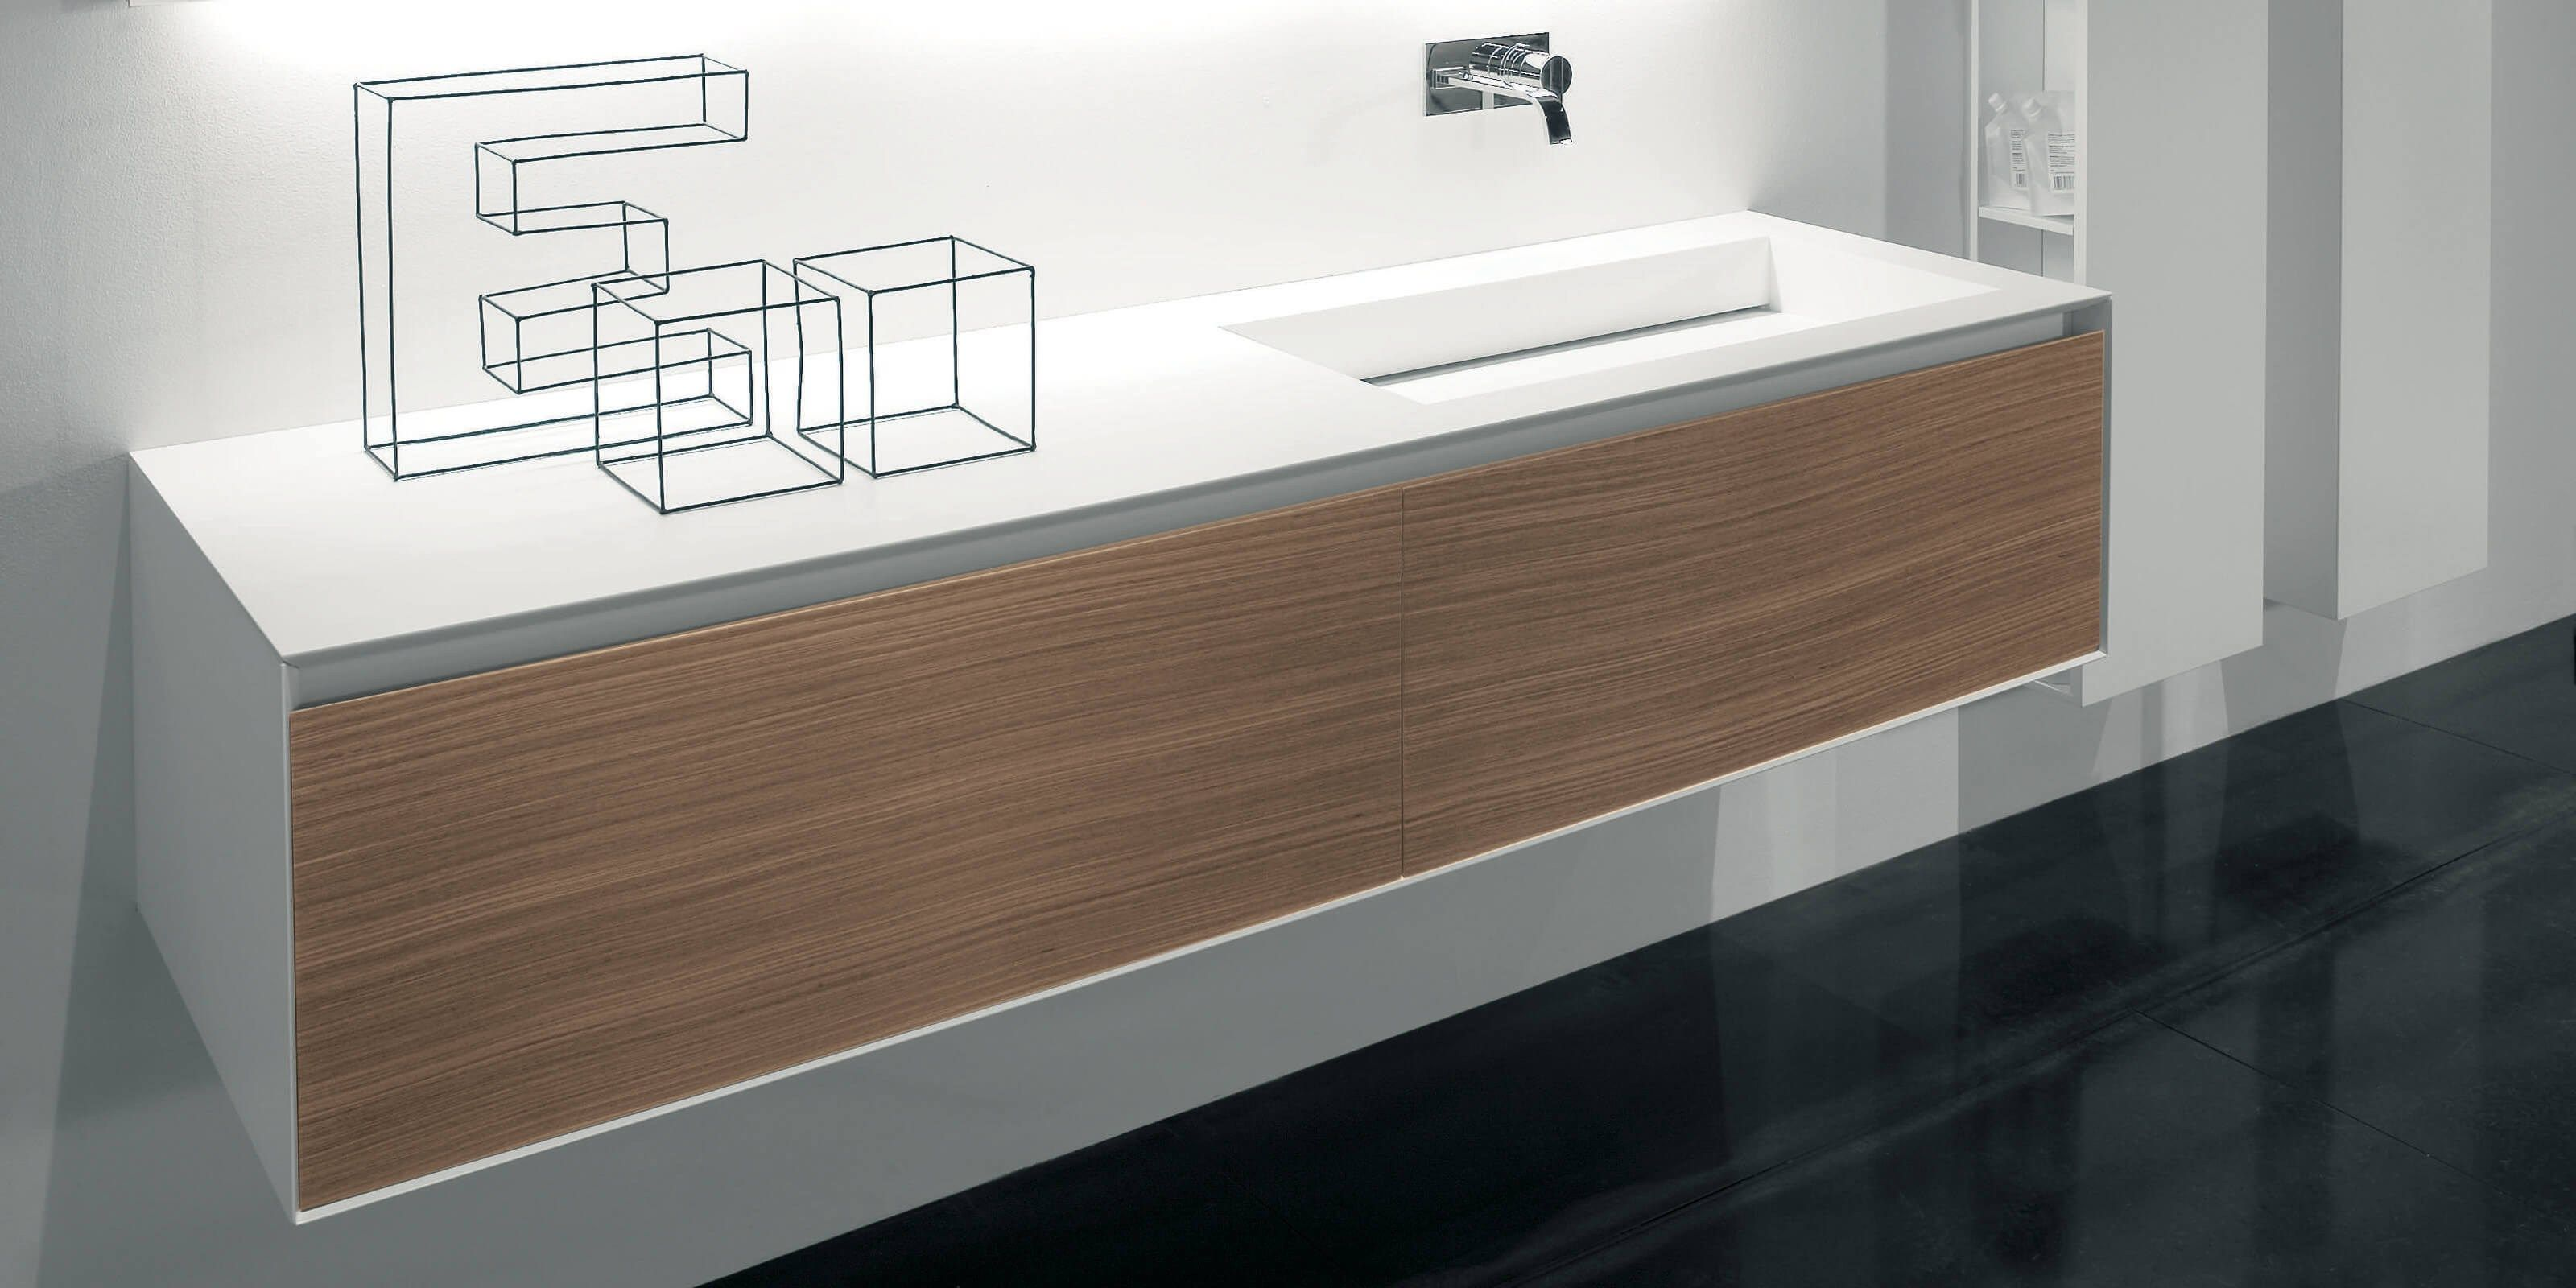 Piano Lavabo In Corian corian® washbasin countertop slot & myslot - antonio lupi